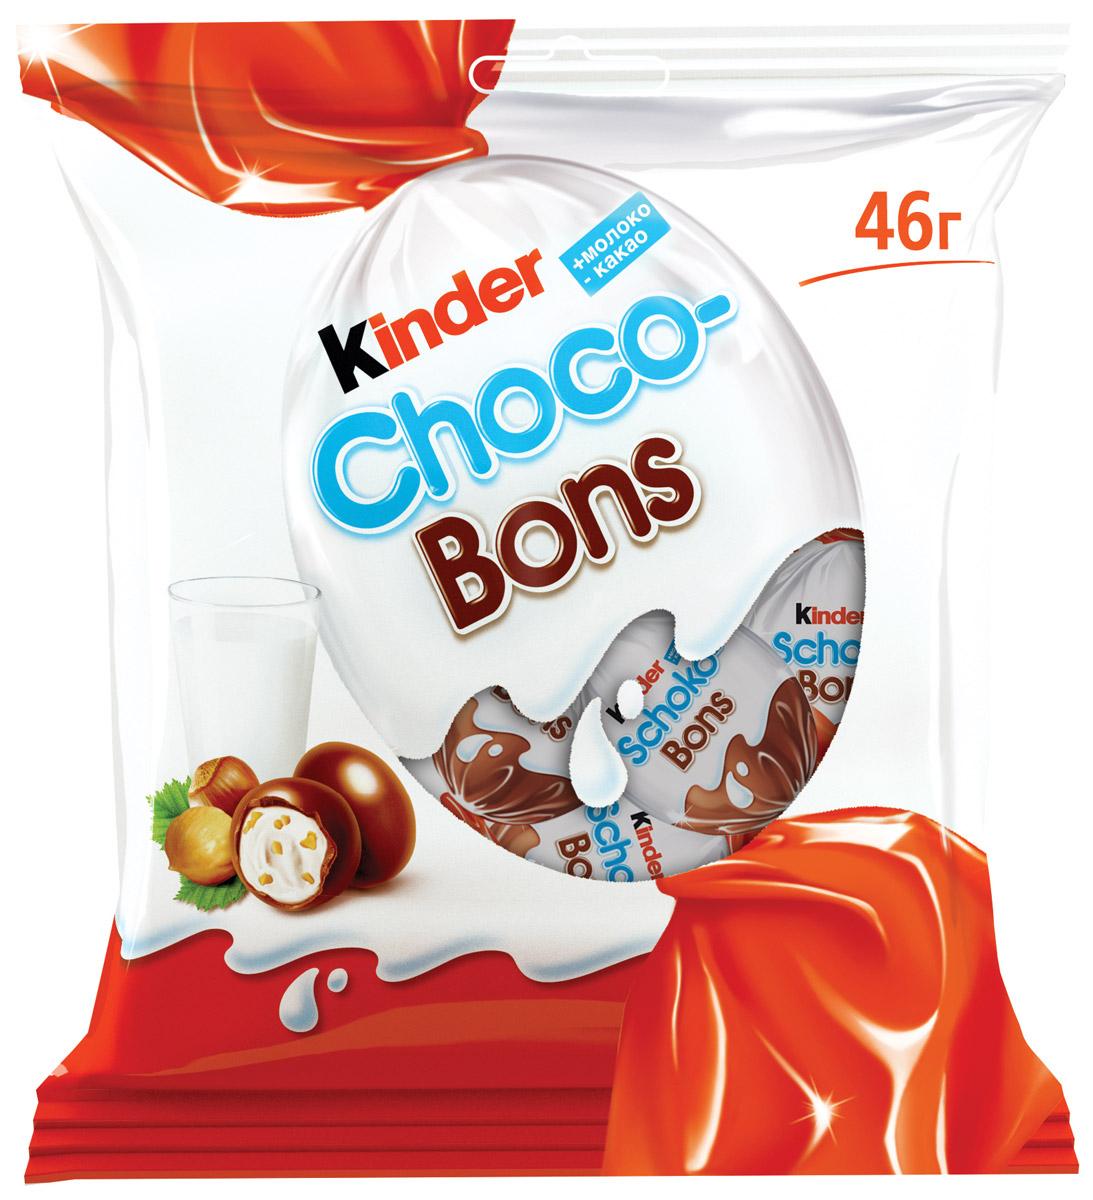 Kinder Choco Bons конфеты из молочного шоколада с молочно-ореховой начинкой, 46 г